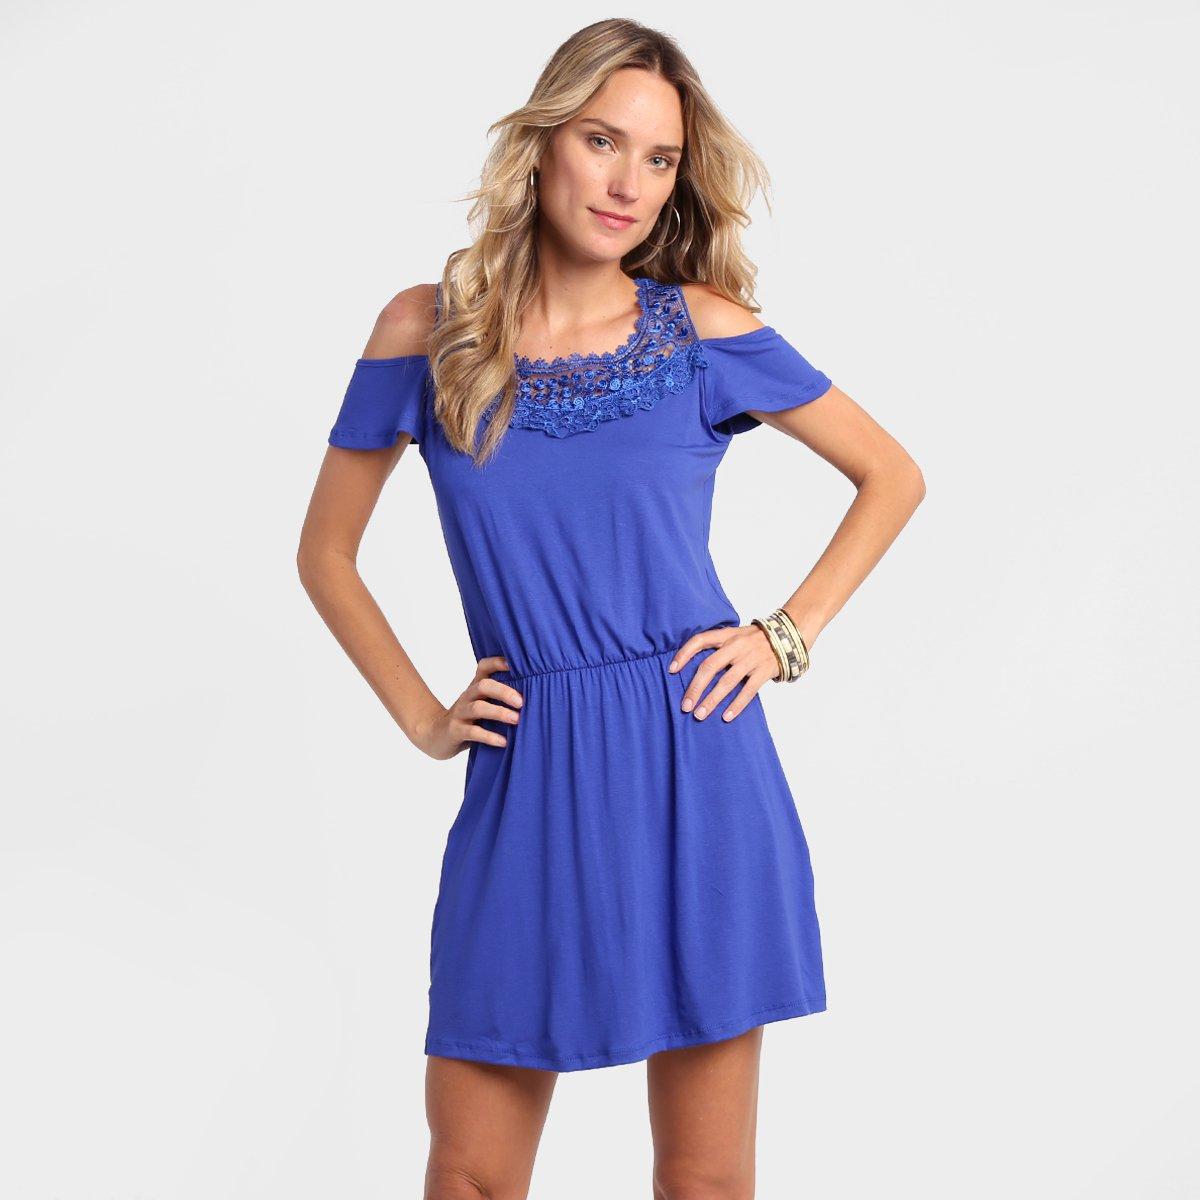 Vestido de guipir azul royal